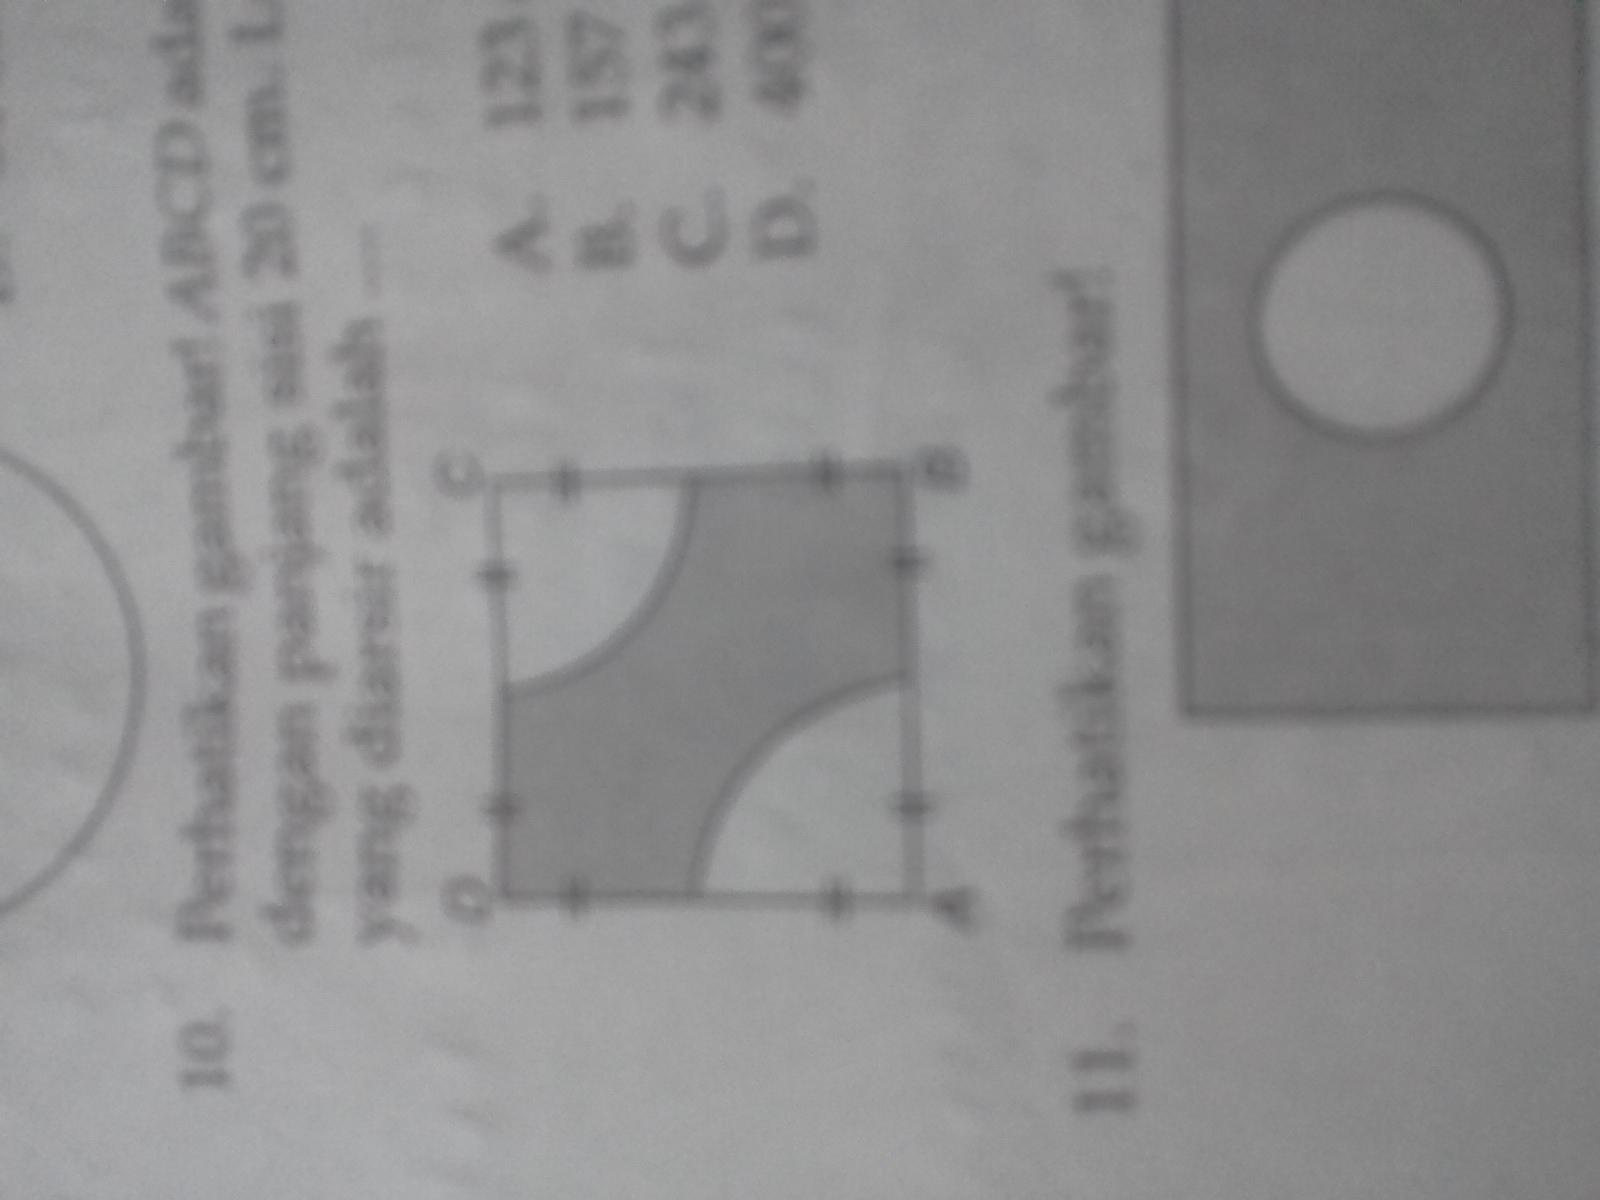 perhatikan gambar ABCD adalah persegi dengan panjang sisi ...